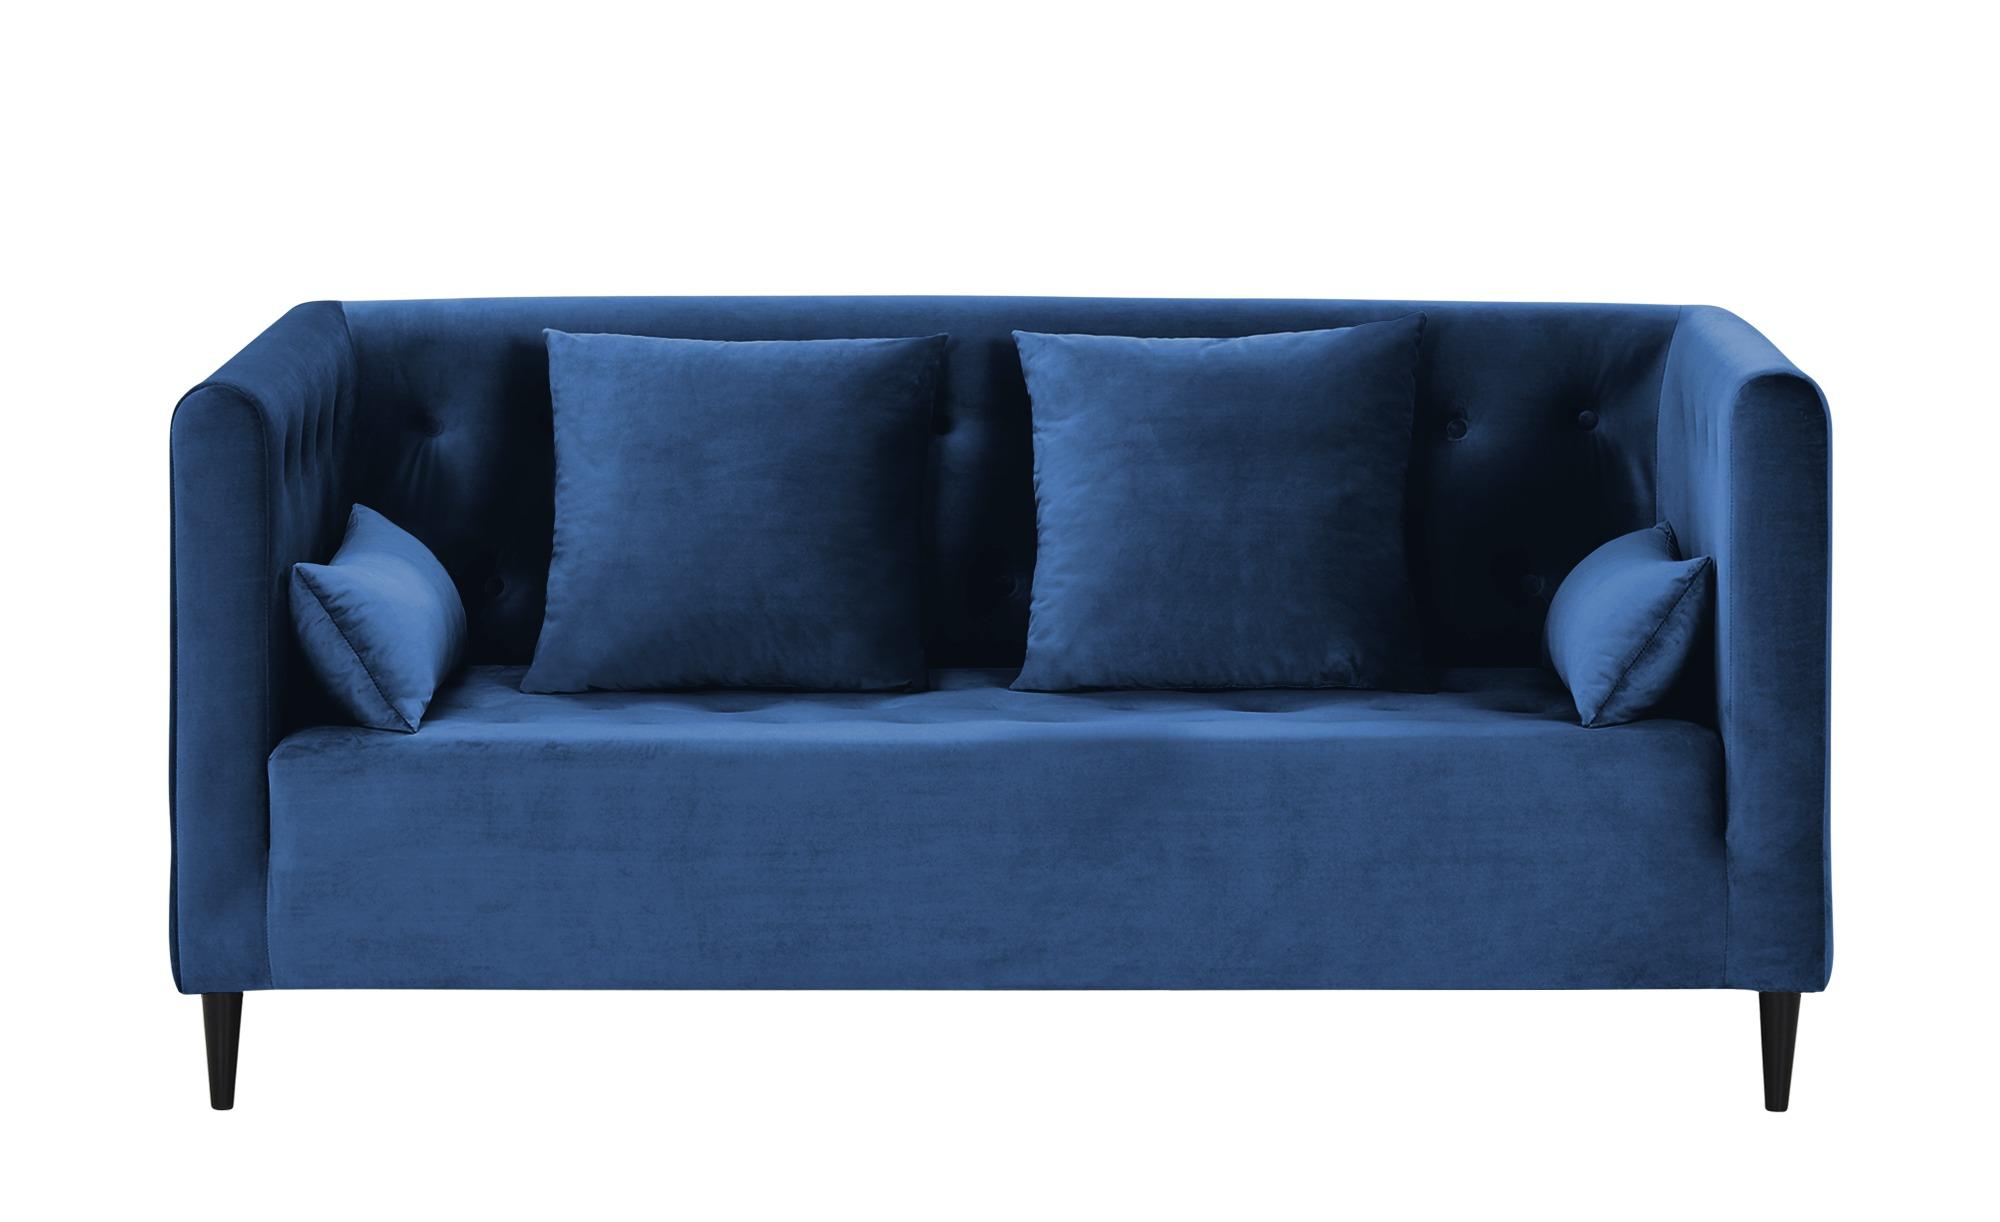 smart Sofa  Neea ¦ blau ¦ Maße (cm): B: 181 H: 82 T: 88 Polstermöbel > Sofas > 2-Sitzer - Höffner